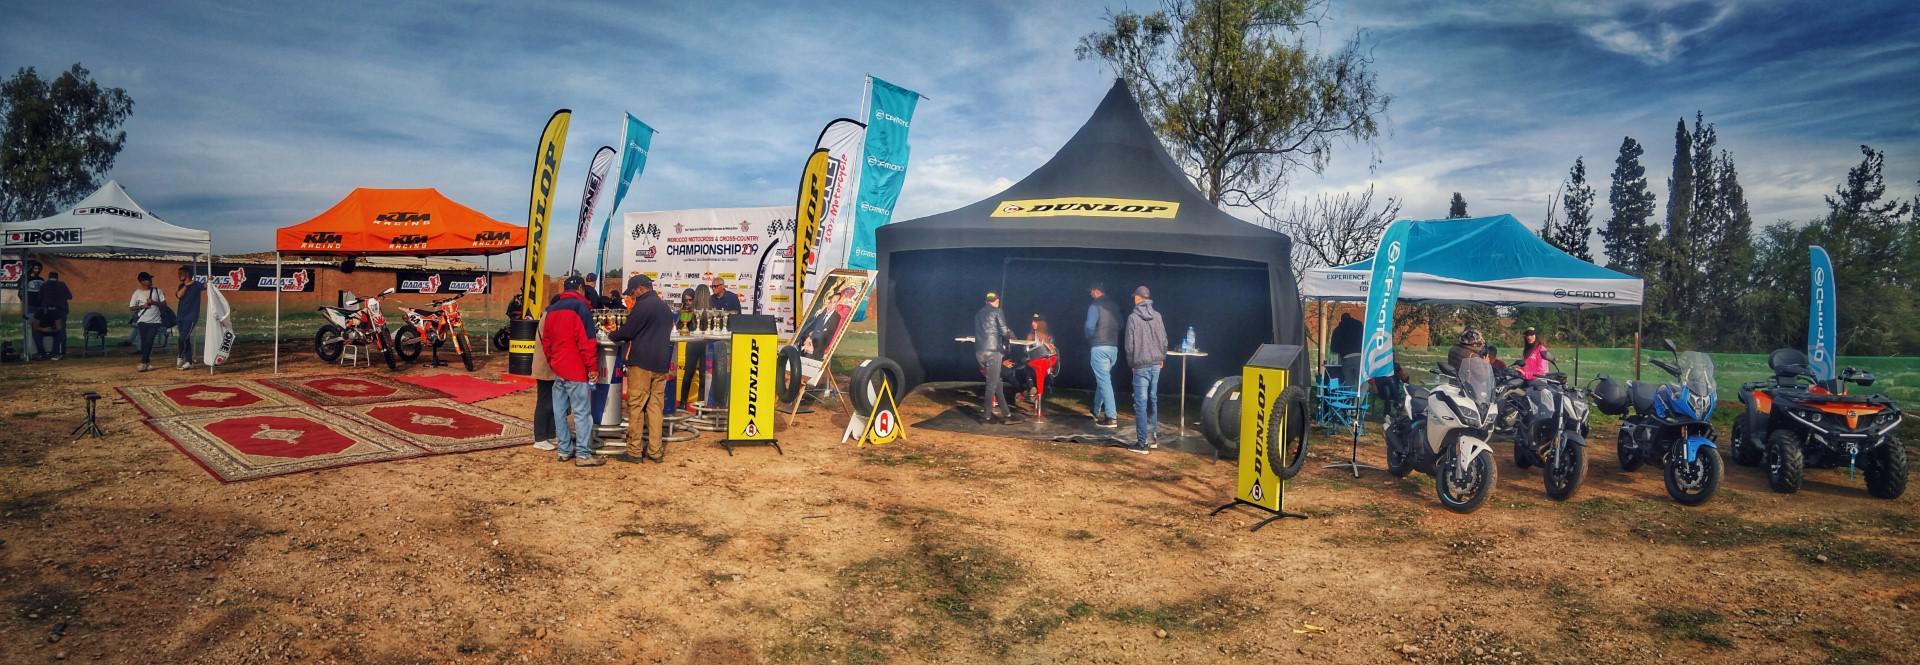 finale-du-championnat-du-maroc-de-motocross-et-cross-country-1164-8.jpg